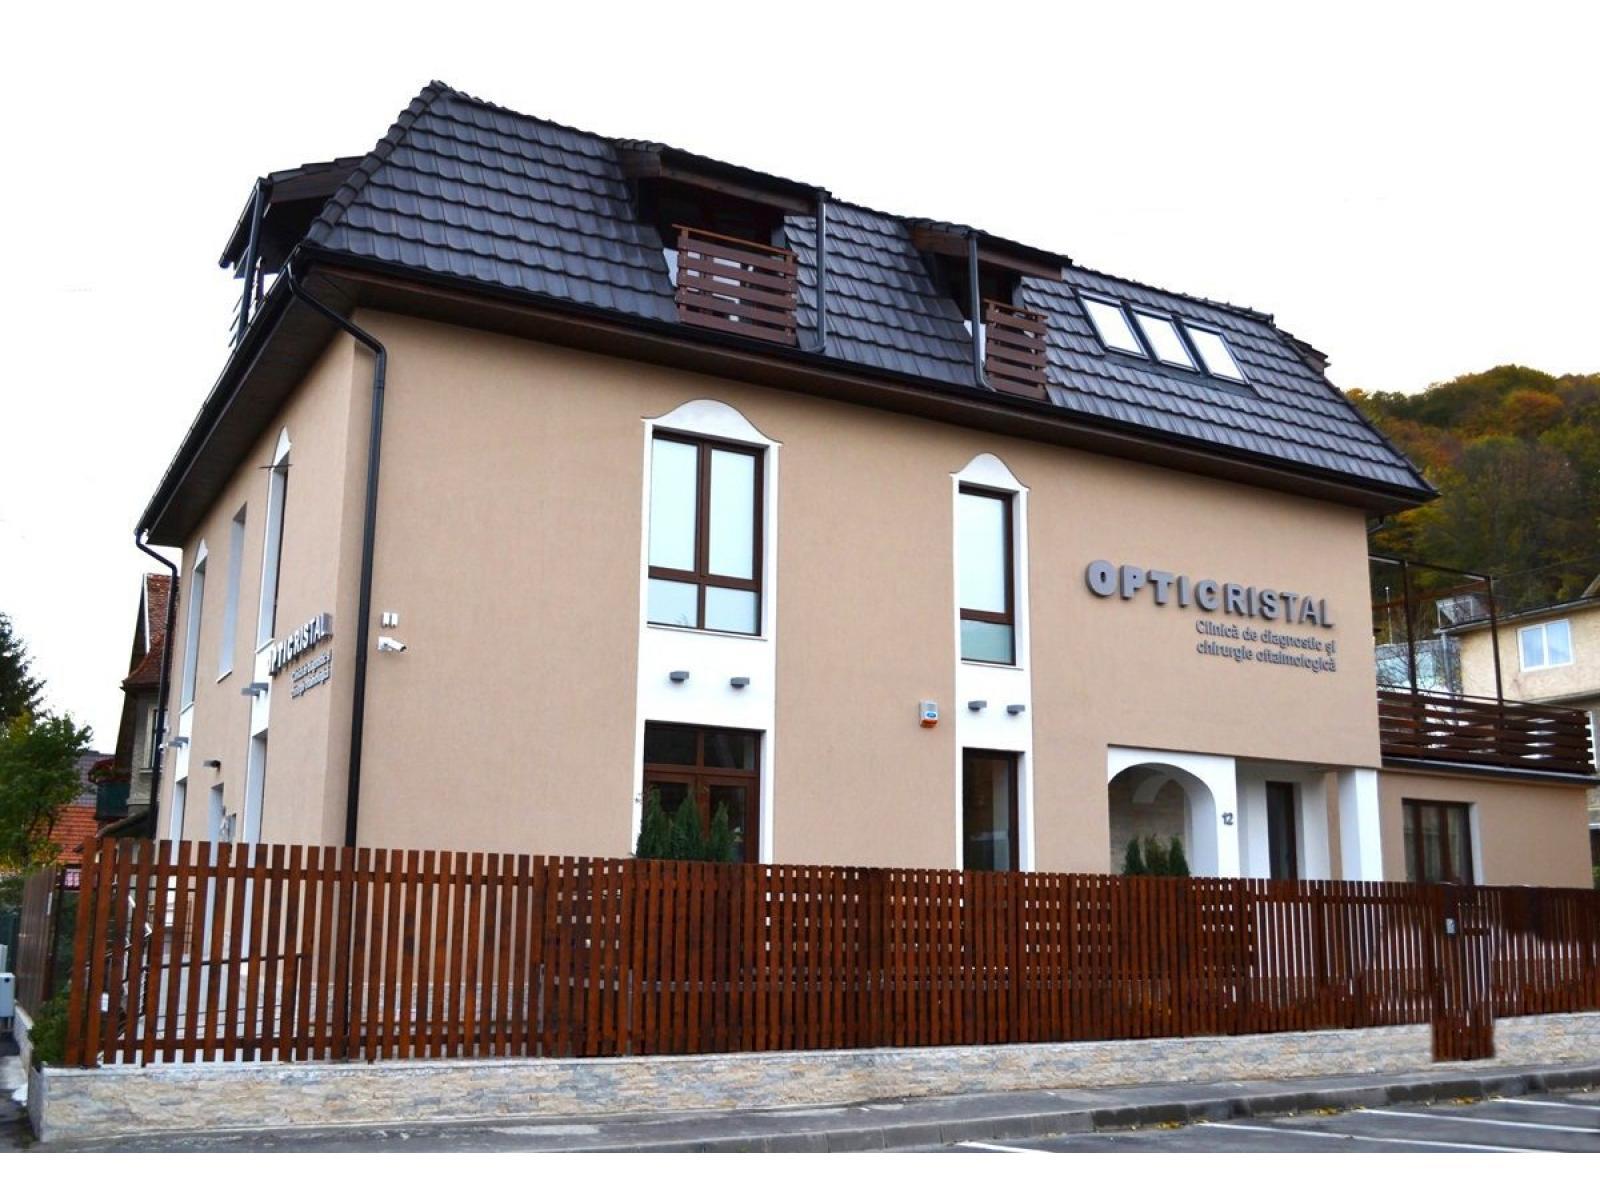 OPTICRISTAL - Centru de chirurgie oftalmologica - exterior.jpg